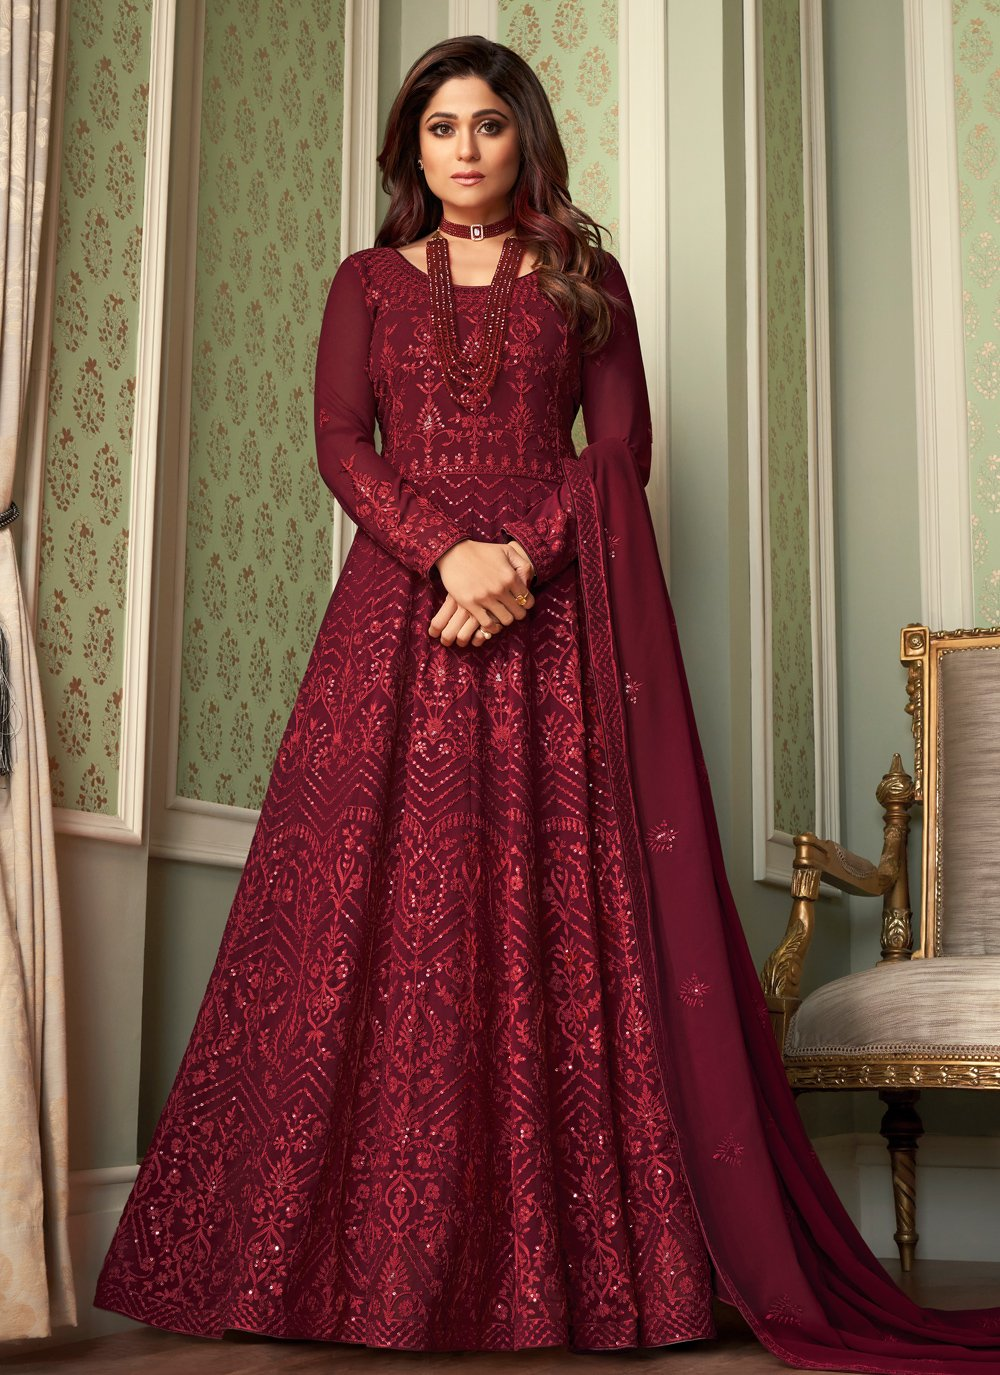 Shamita Shetty Faux Georgette Engagement Floor Length Anarkali Suit